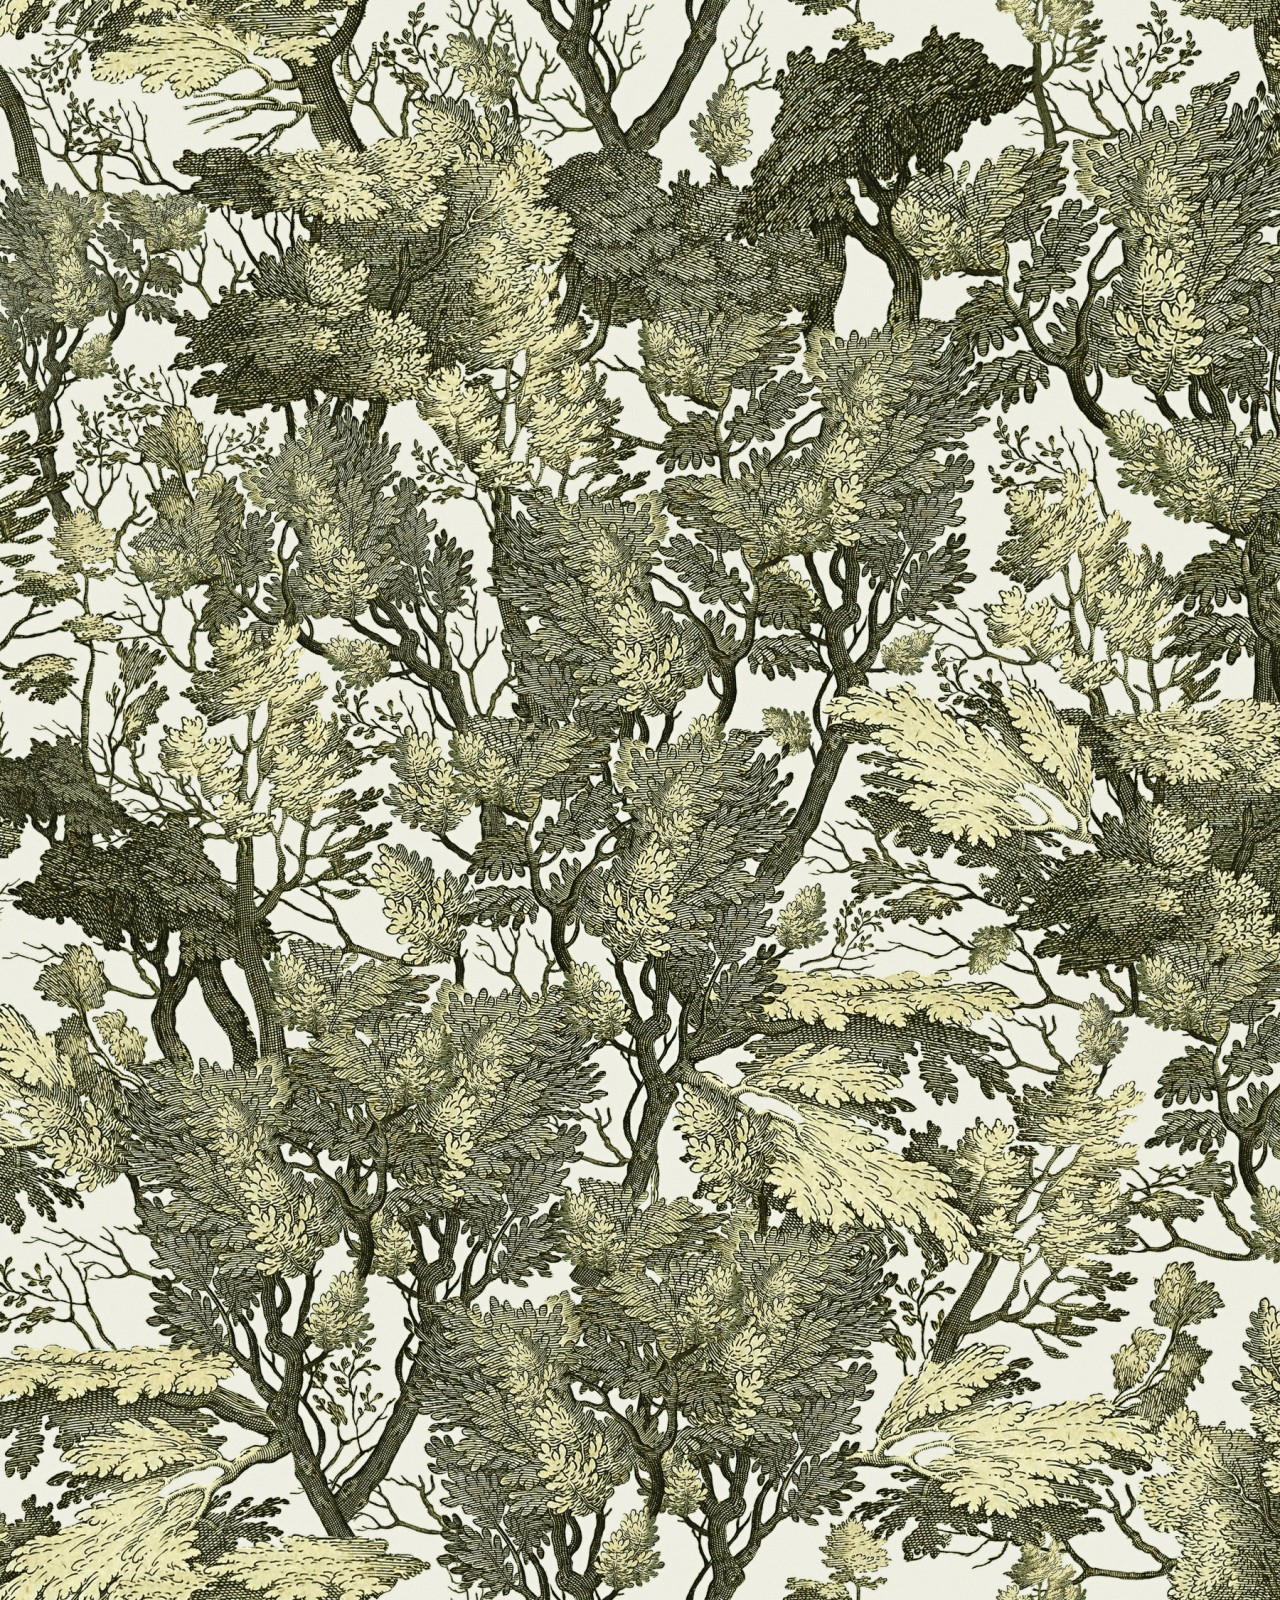 TREE FOLIAGE Wallpaper